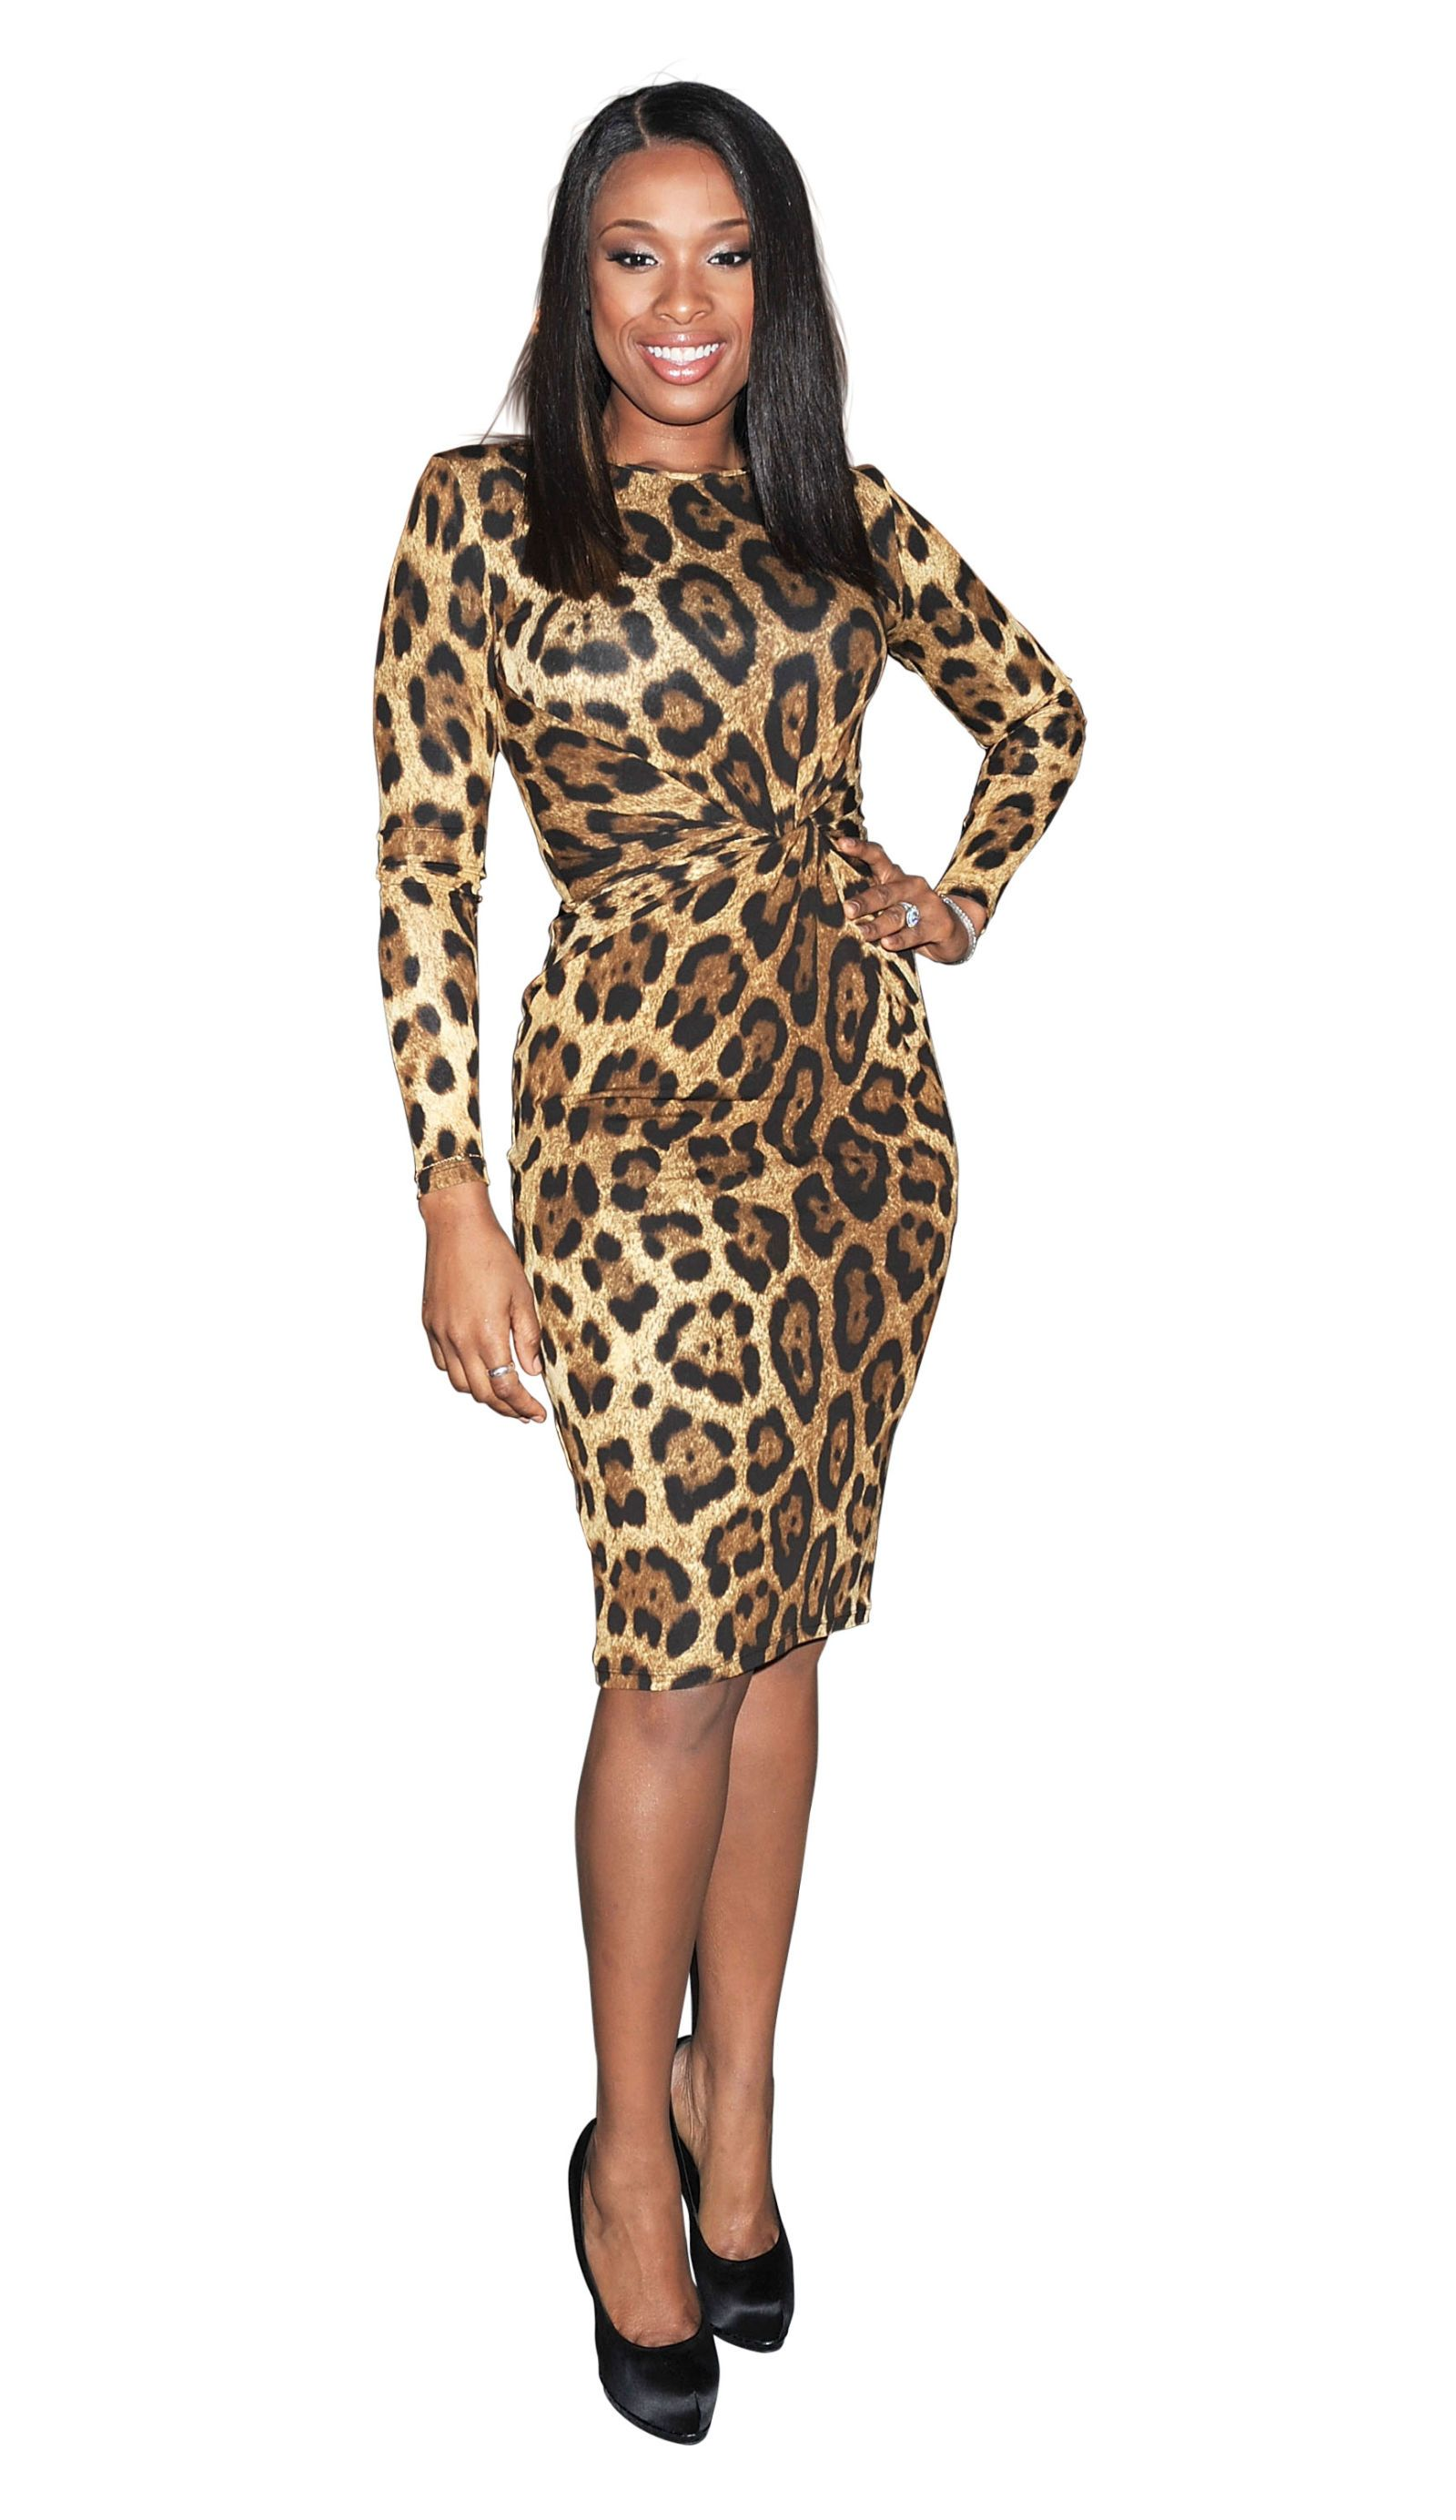 jennifer hudson leopard dress